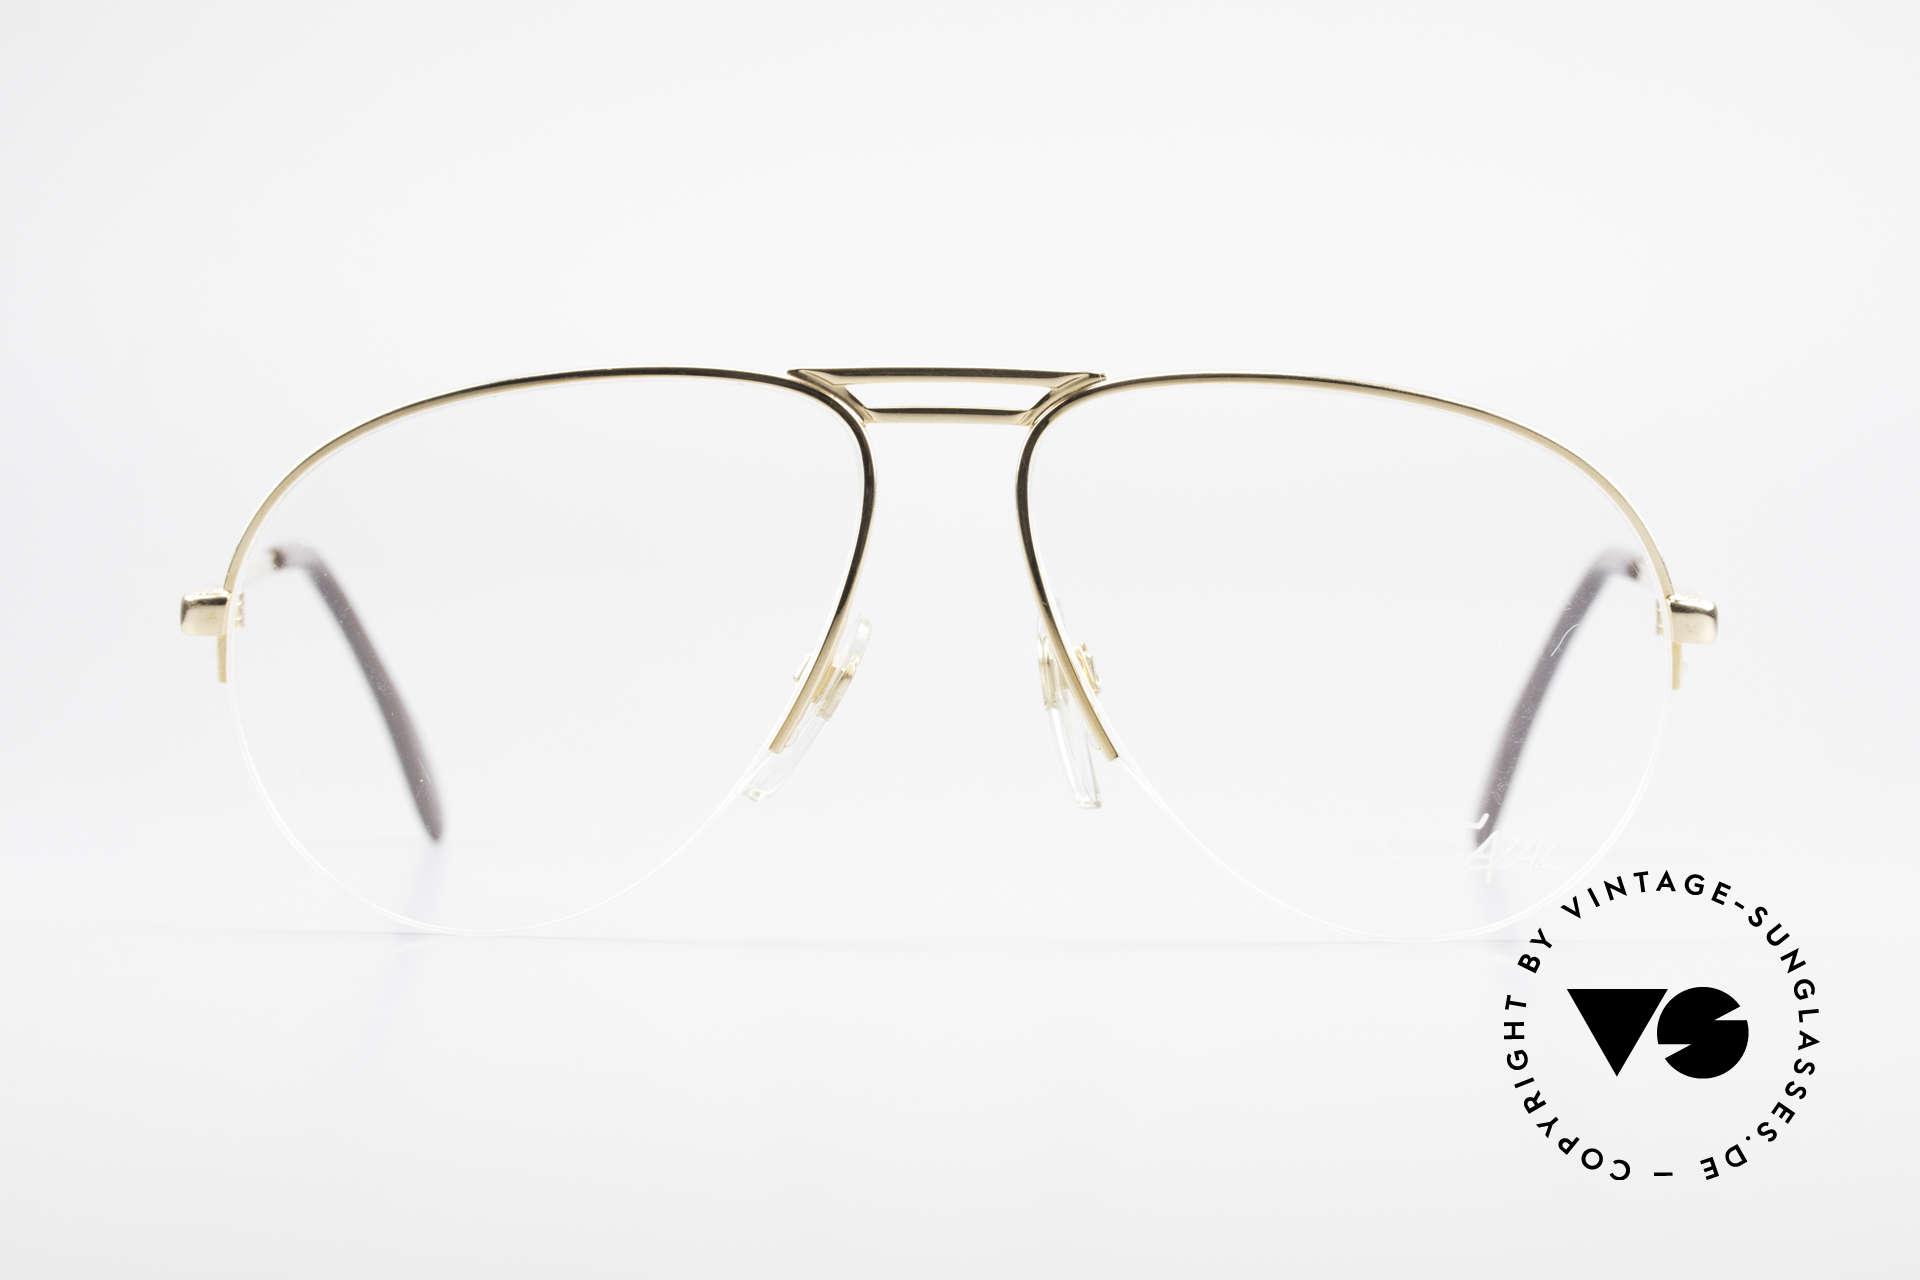 Cazal 726 West Germany Aviator Glasses, vintage designer eyeglasses by Cari Zalloni, Made for Men